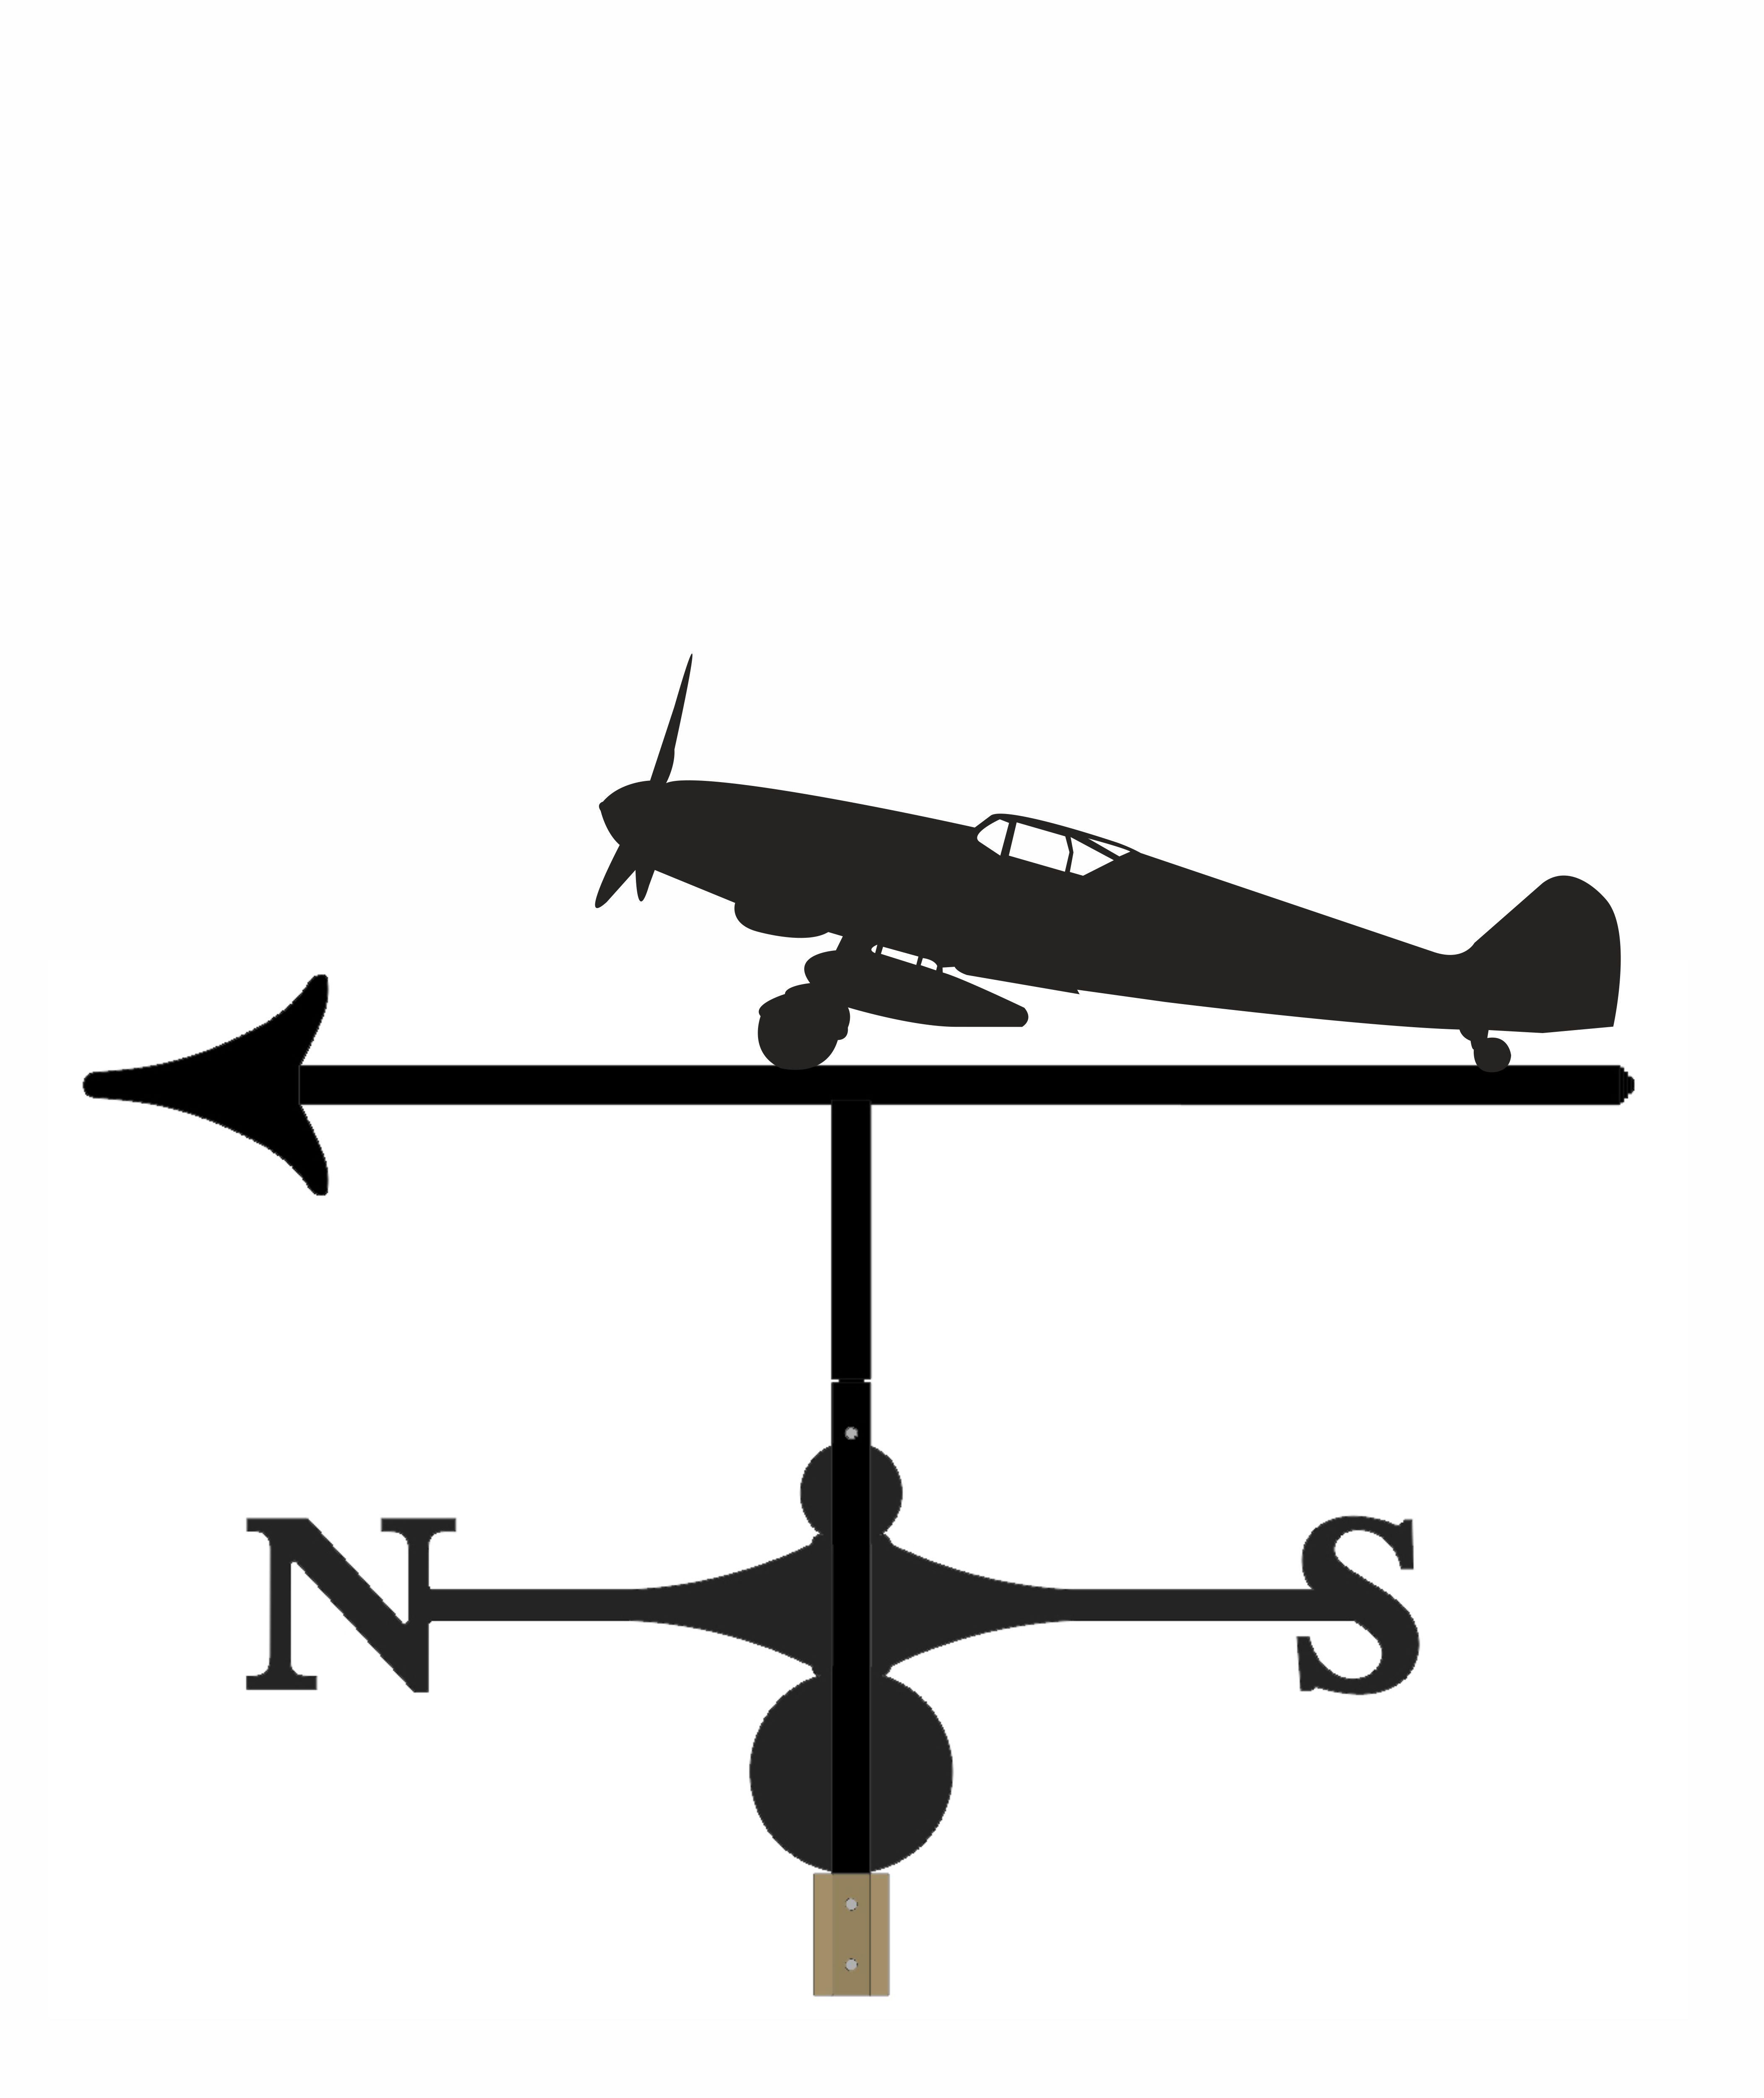 Plane - WVSP1